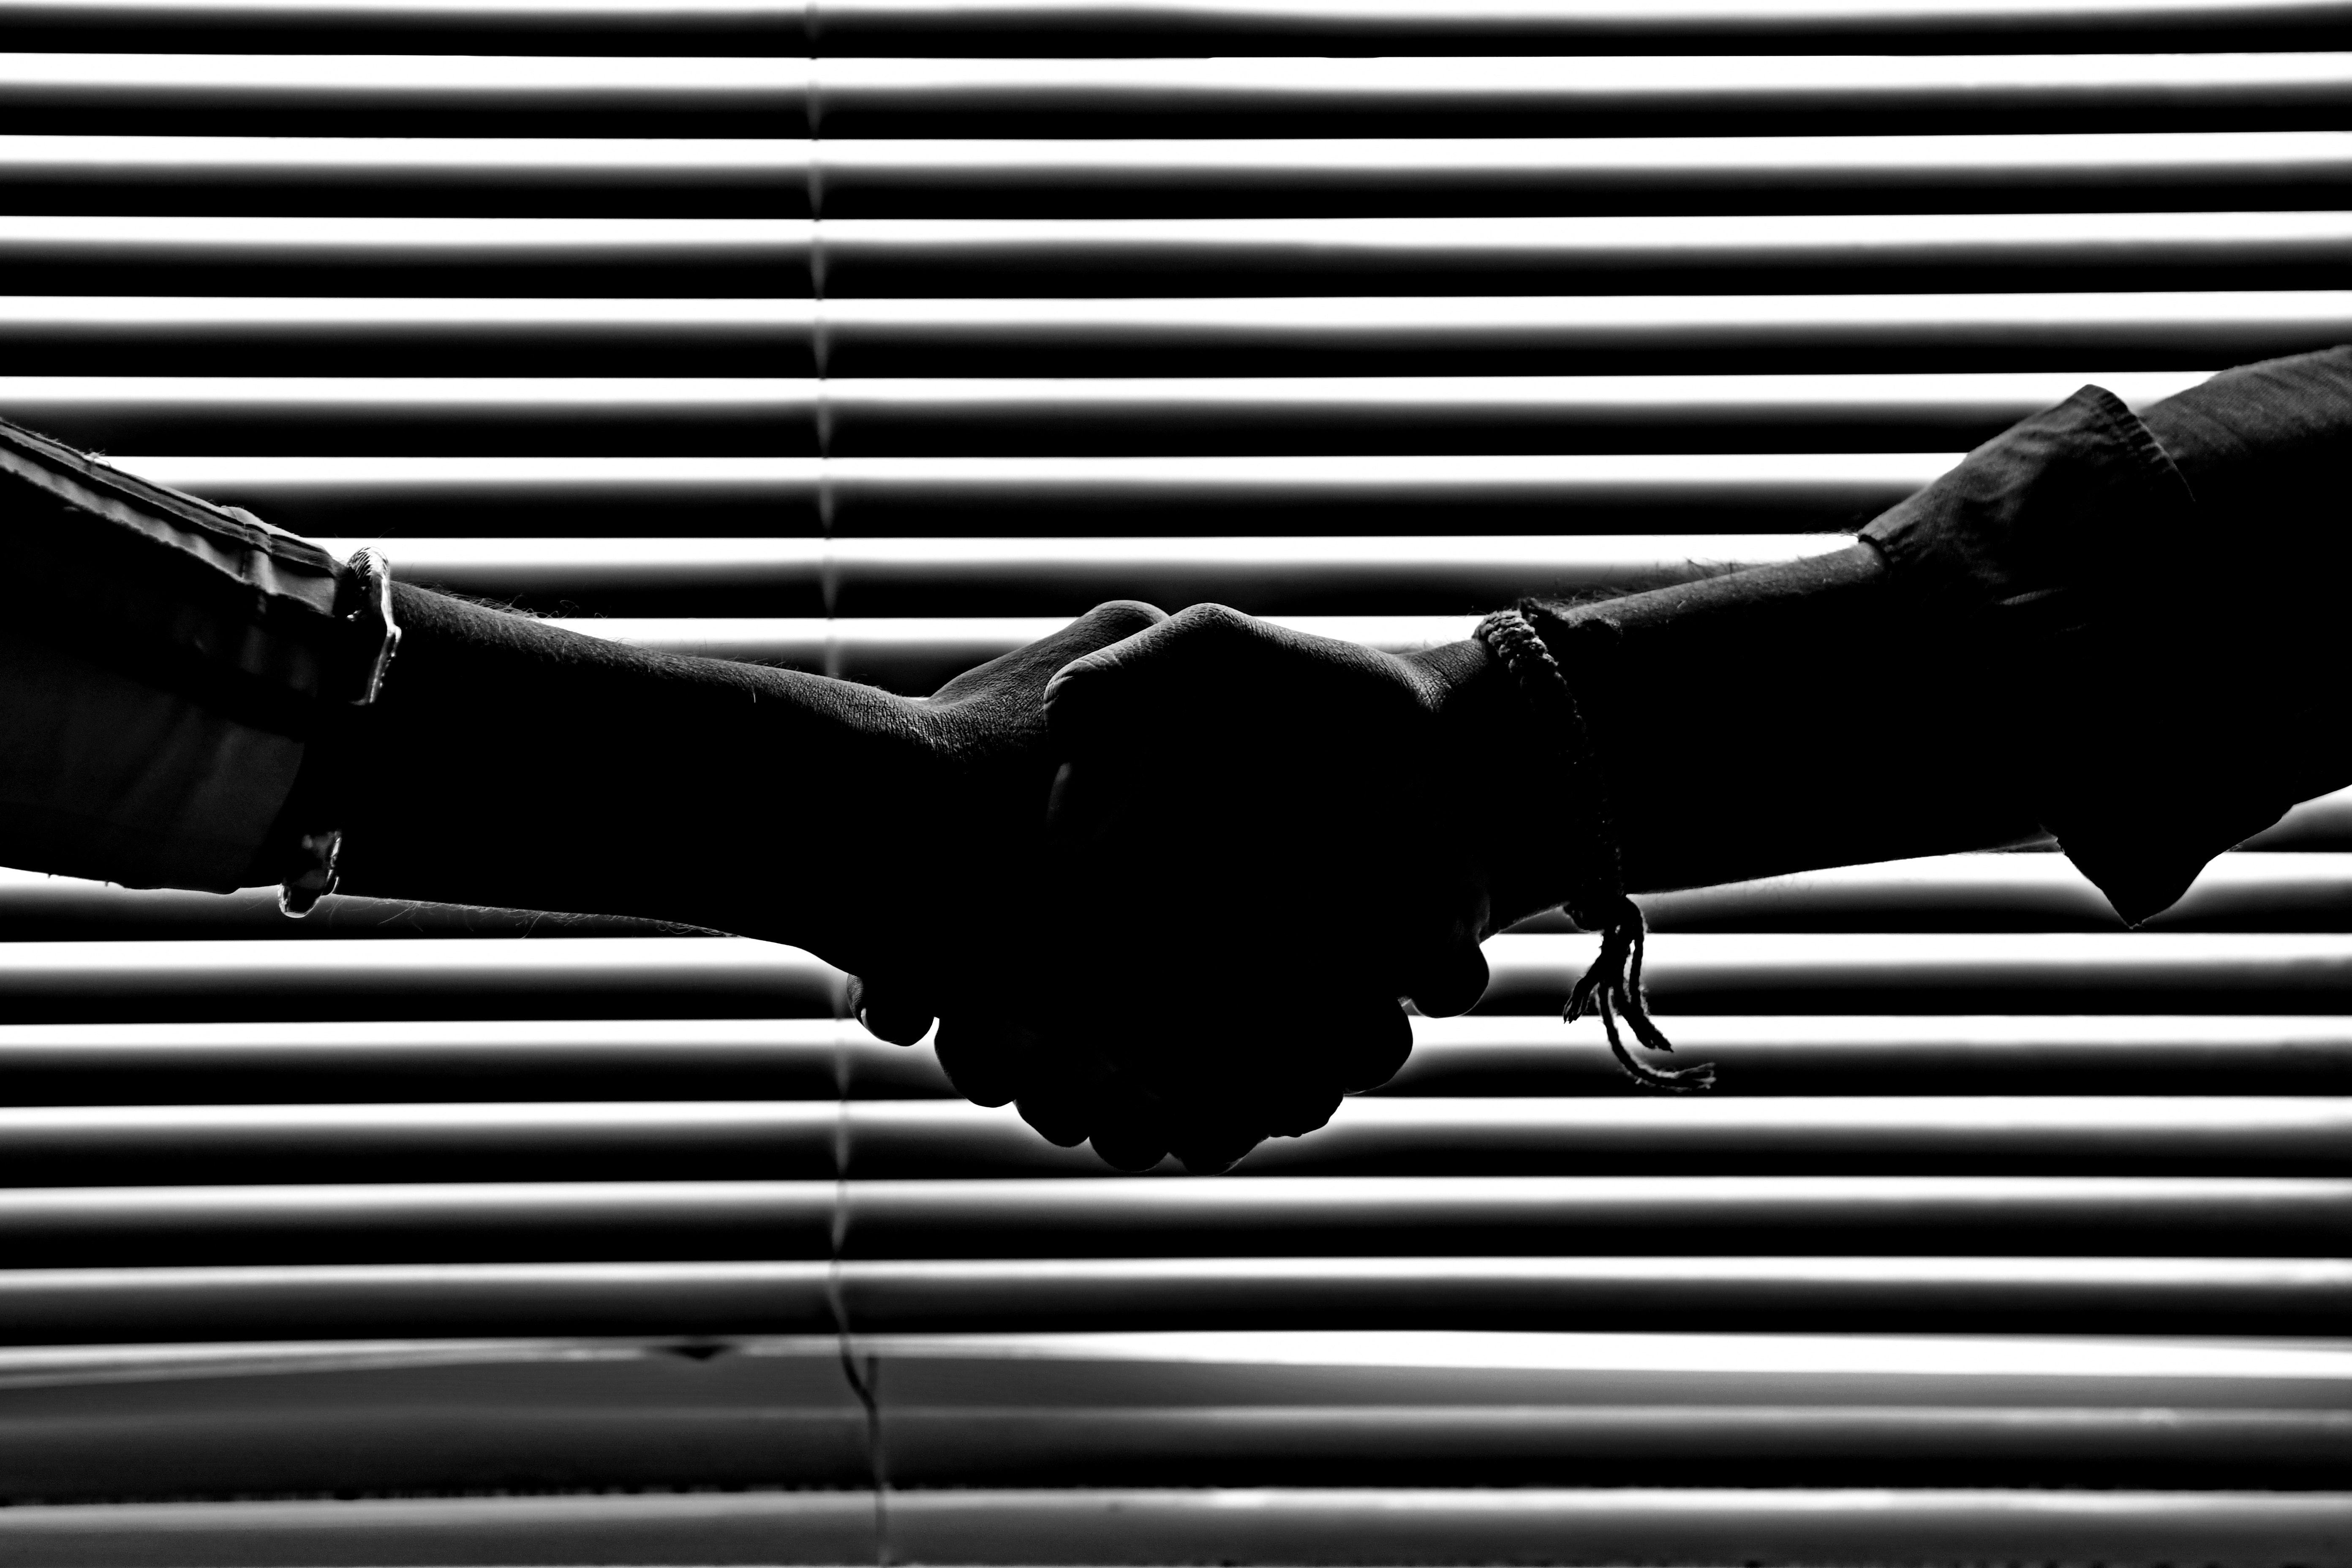 black-and-white-bracelet-cooperation-814544